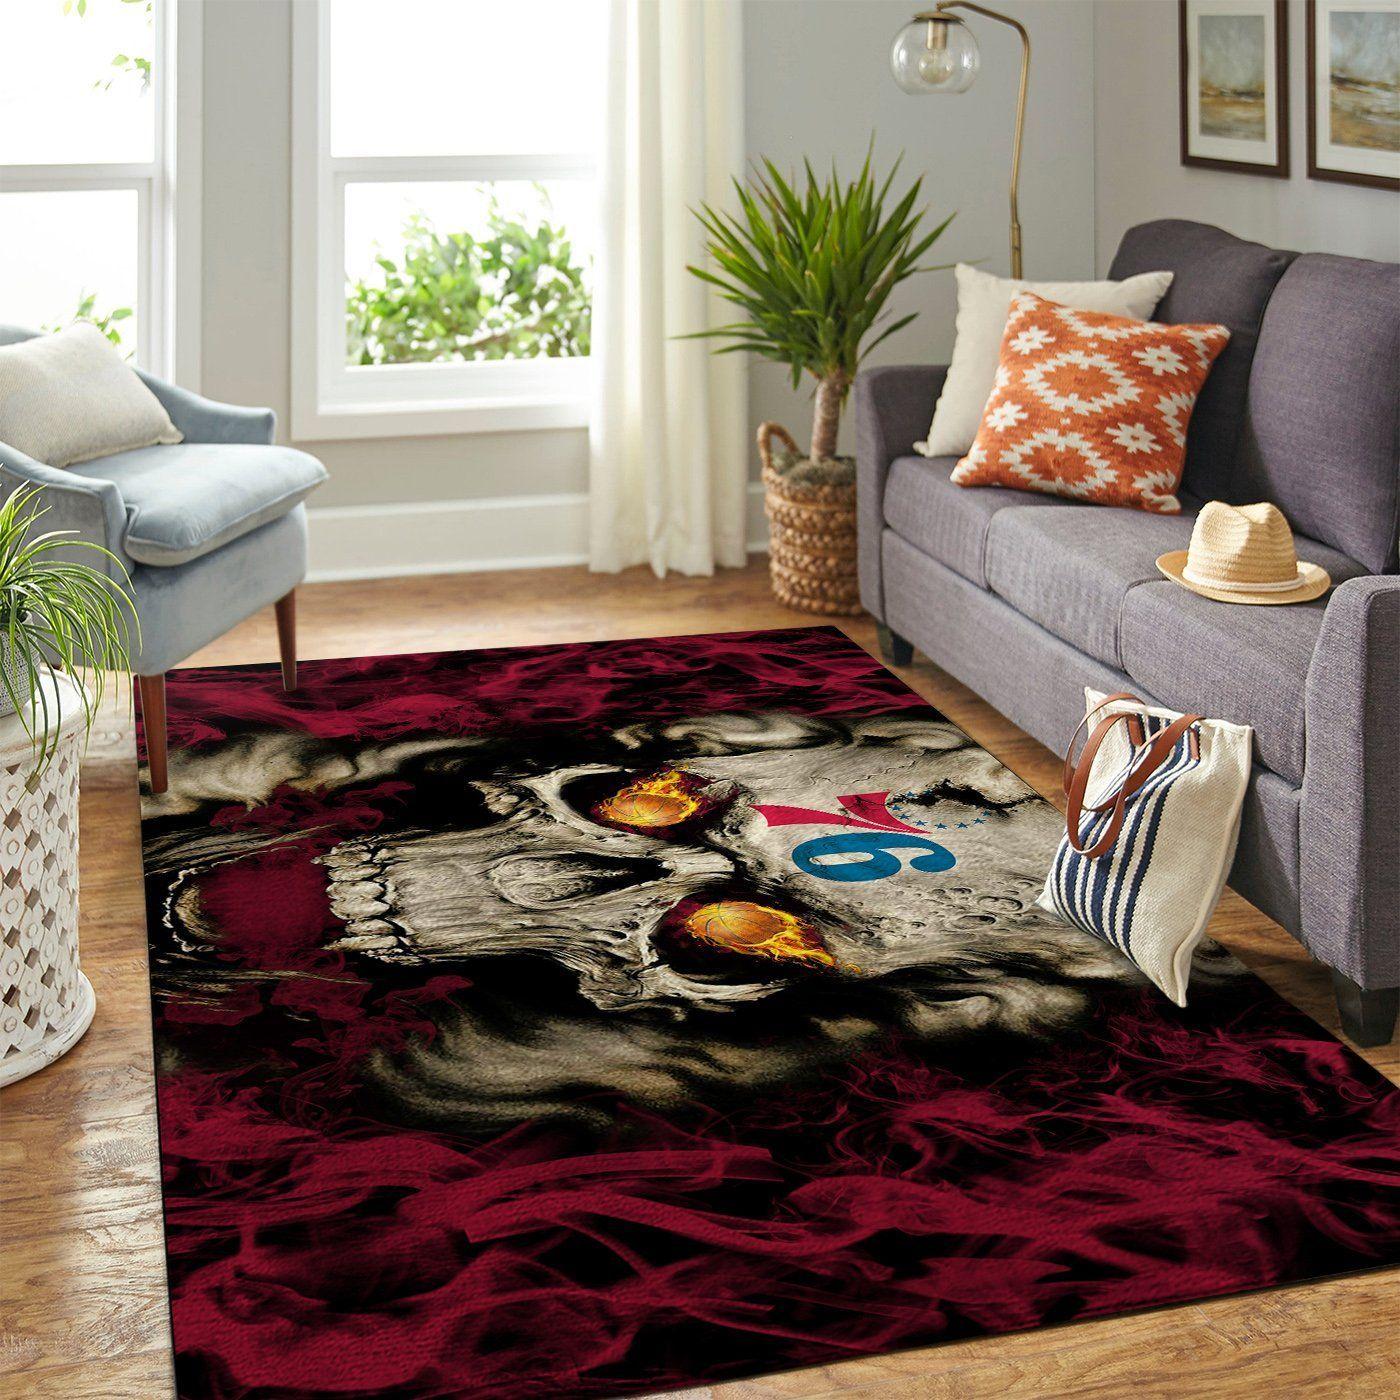 Amazon Philadelphia 76ers Living Room Area No4456 Rug